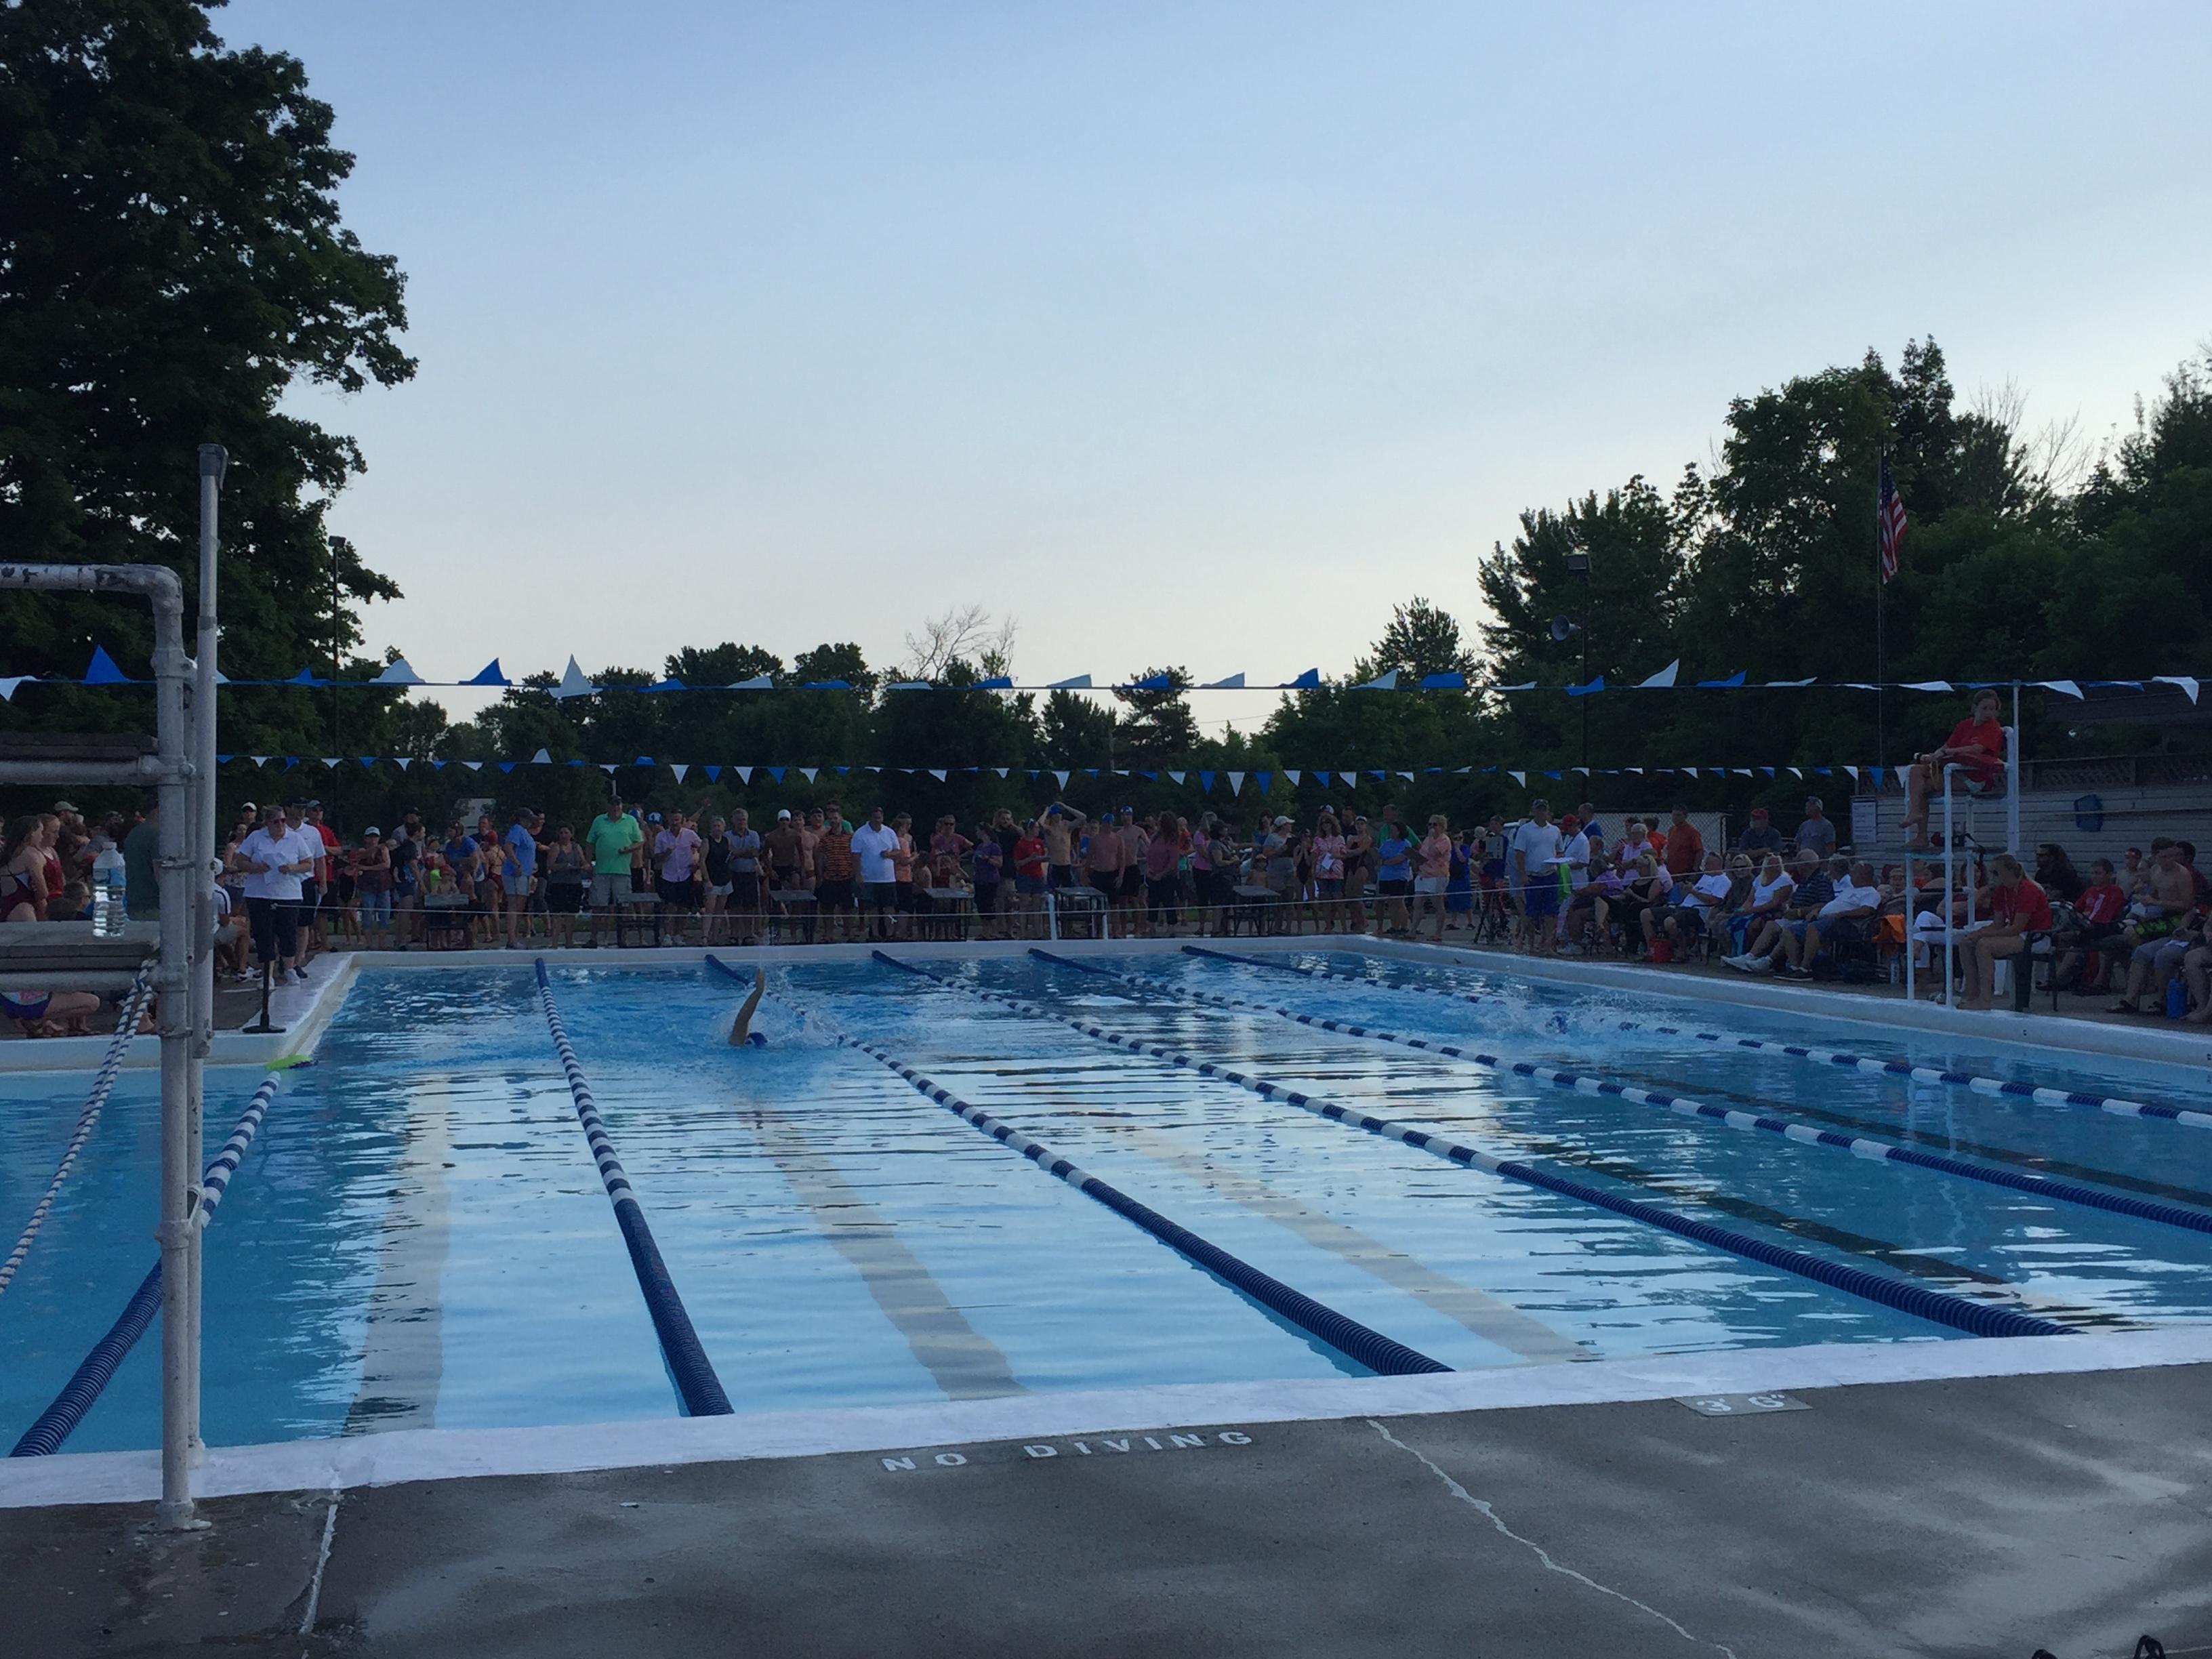 Crestwood Swim Club's six-lane outdoor pool